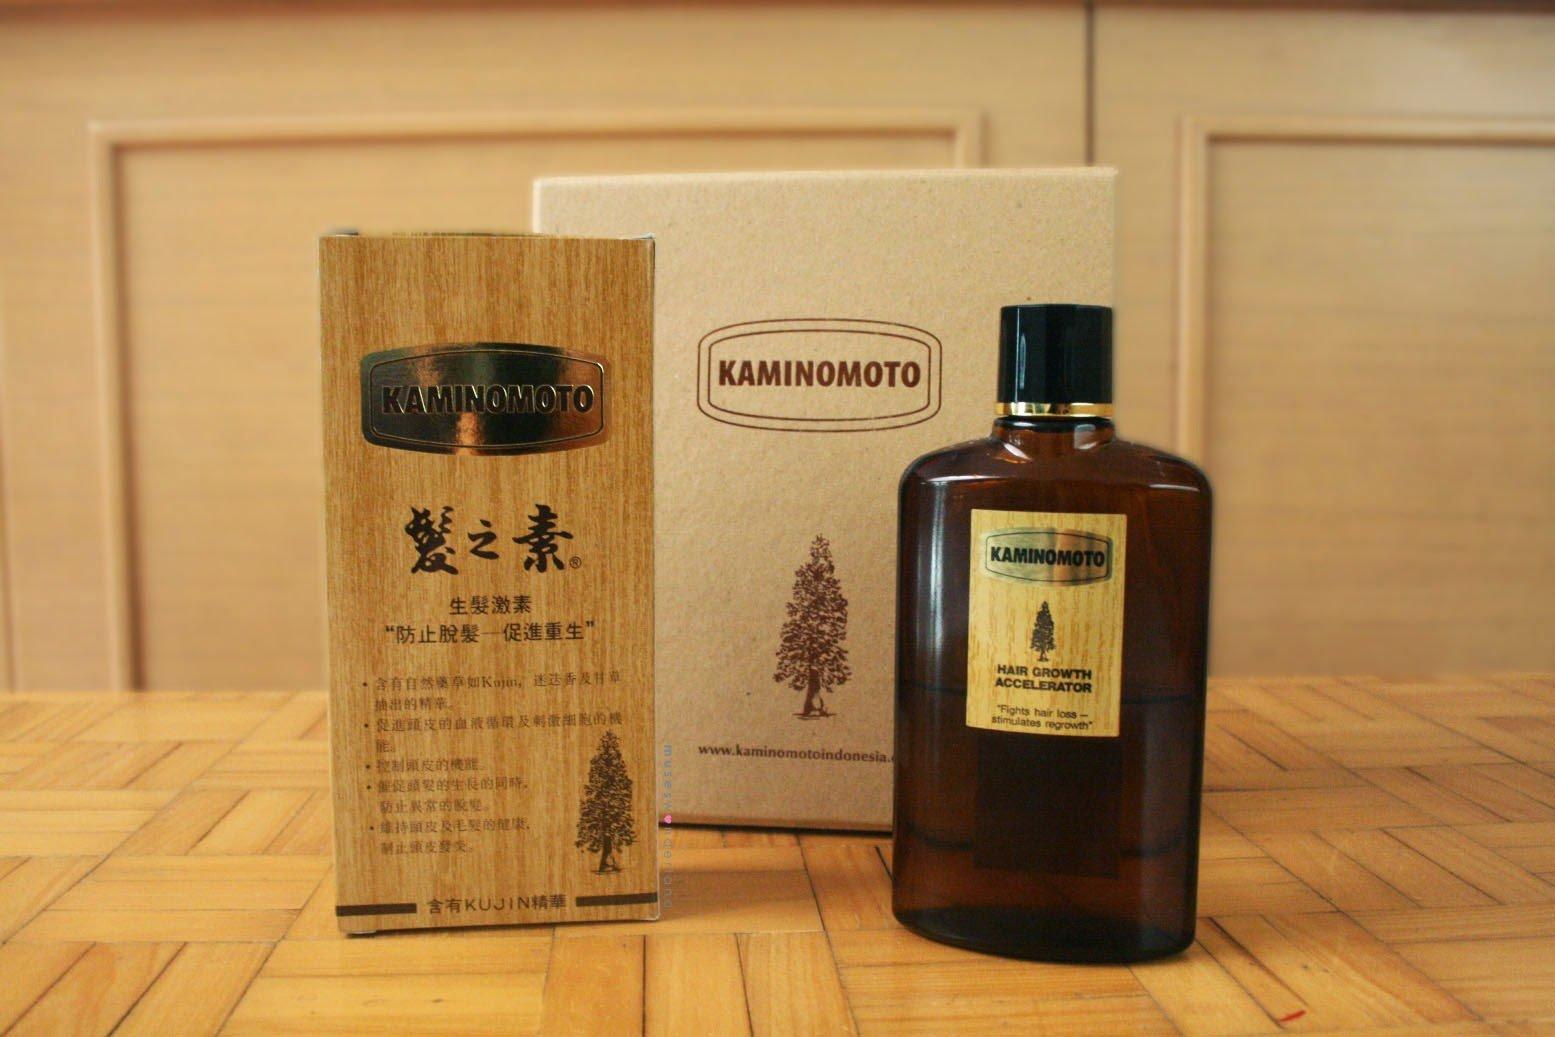 KAMINOMOTO HAIR LOSS AND GROWTH ACCLERATION GOLD 150ml REGROWTH TREATMENT